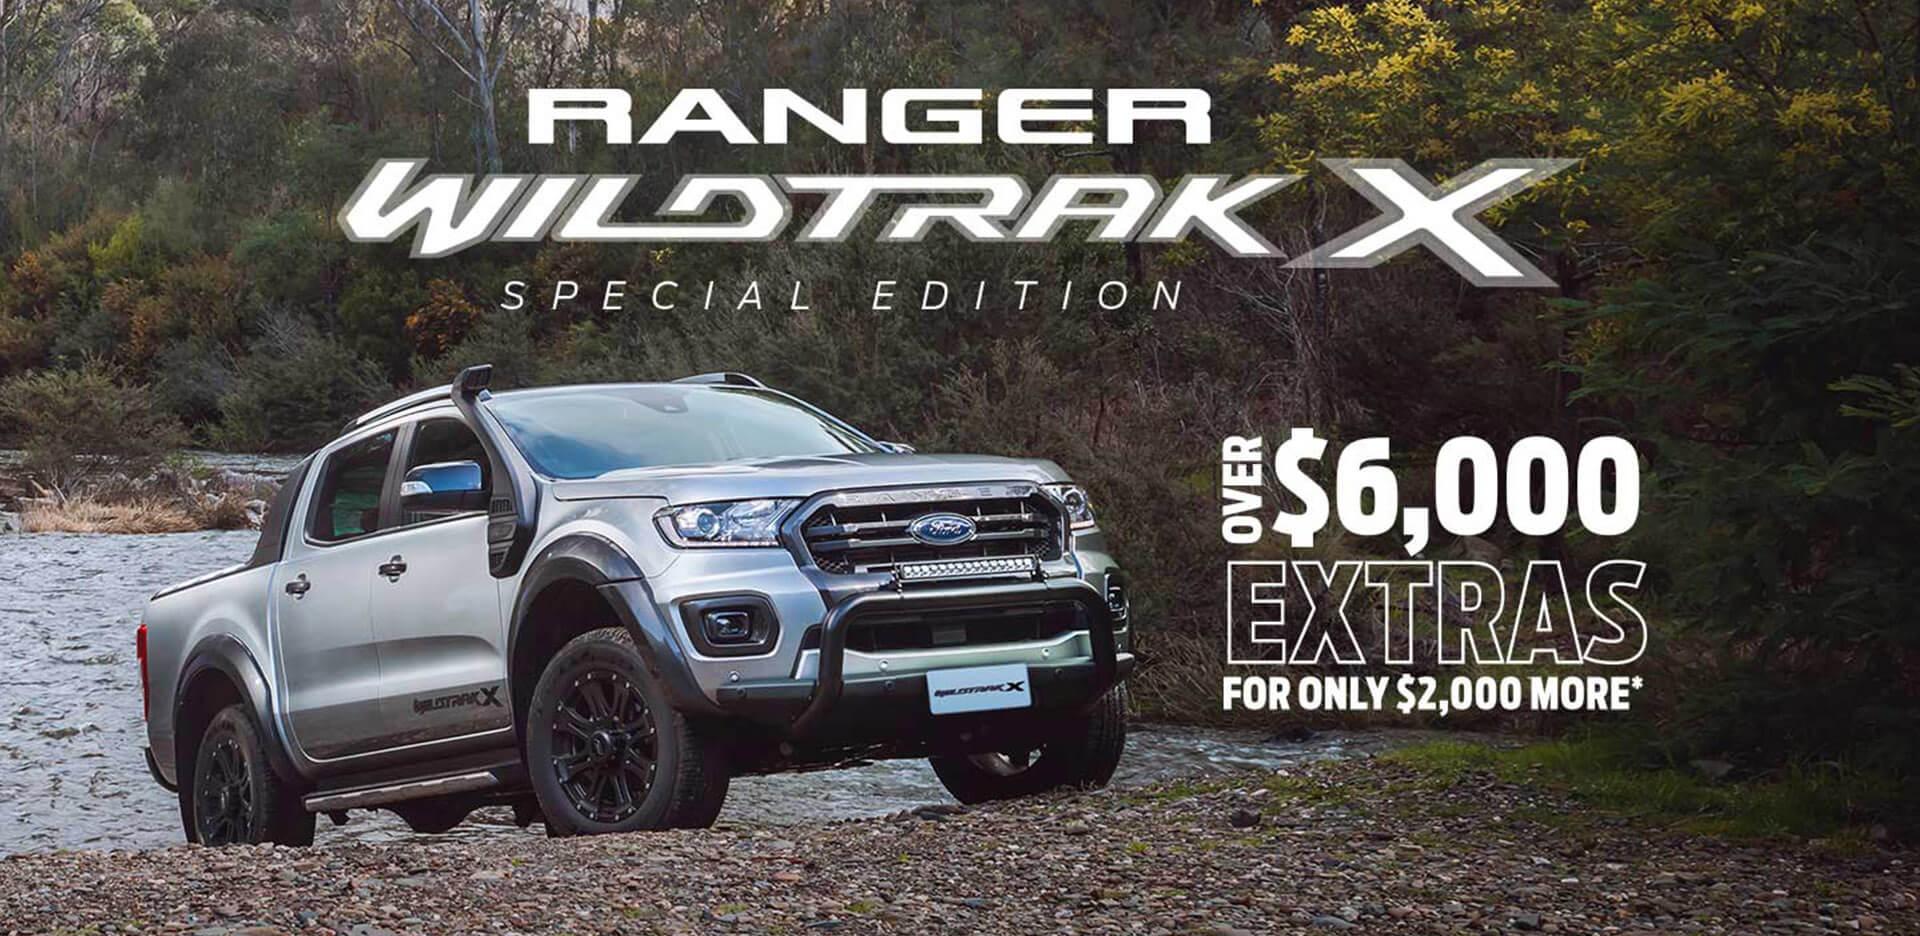 Ford Ranger Wildtrak X Offer